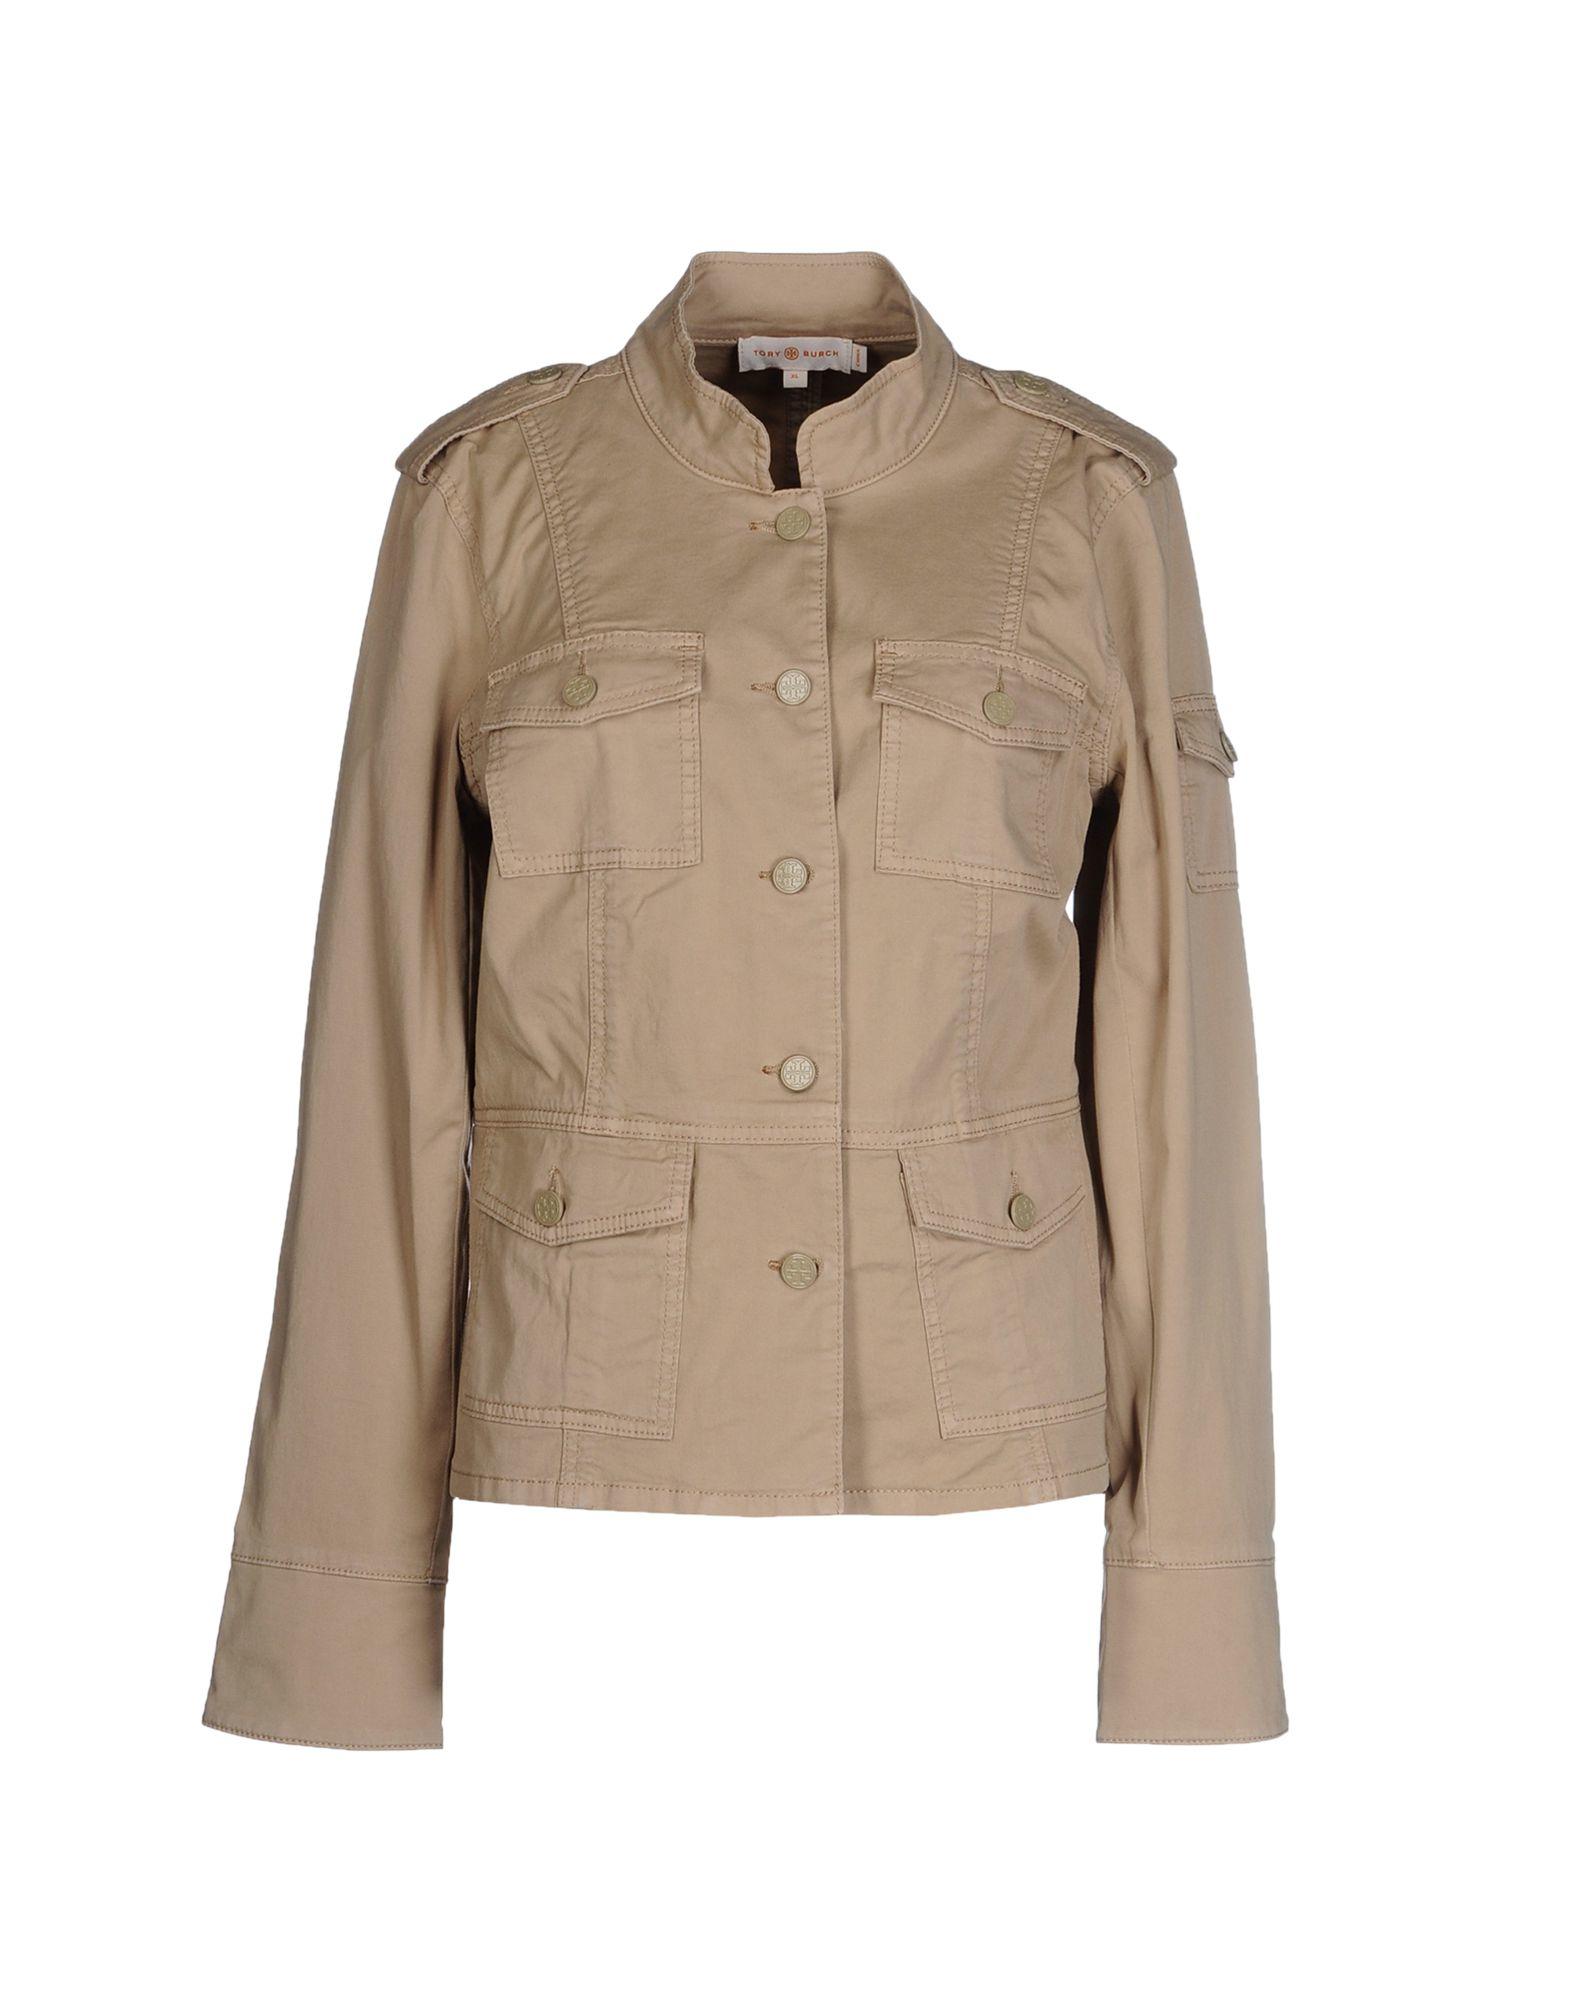 cbd2079c1 Lyst - Tory Burch Jacket in Brown